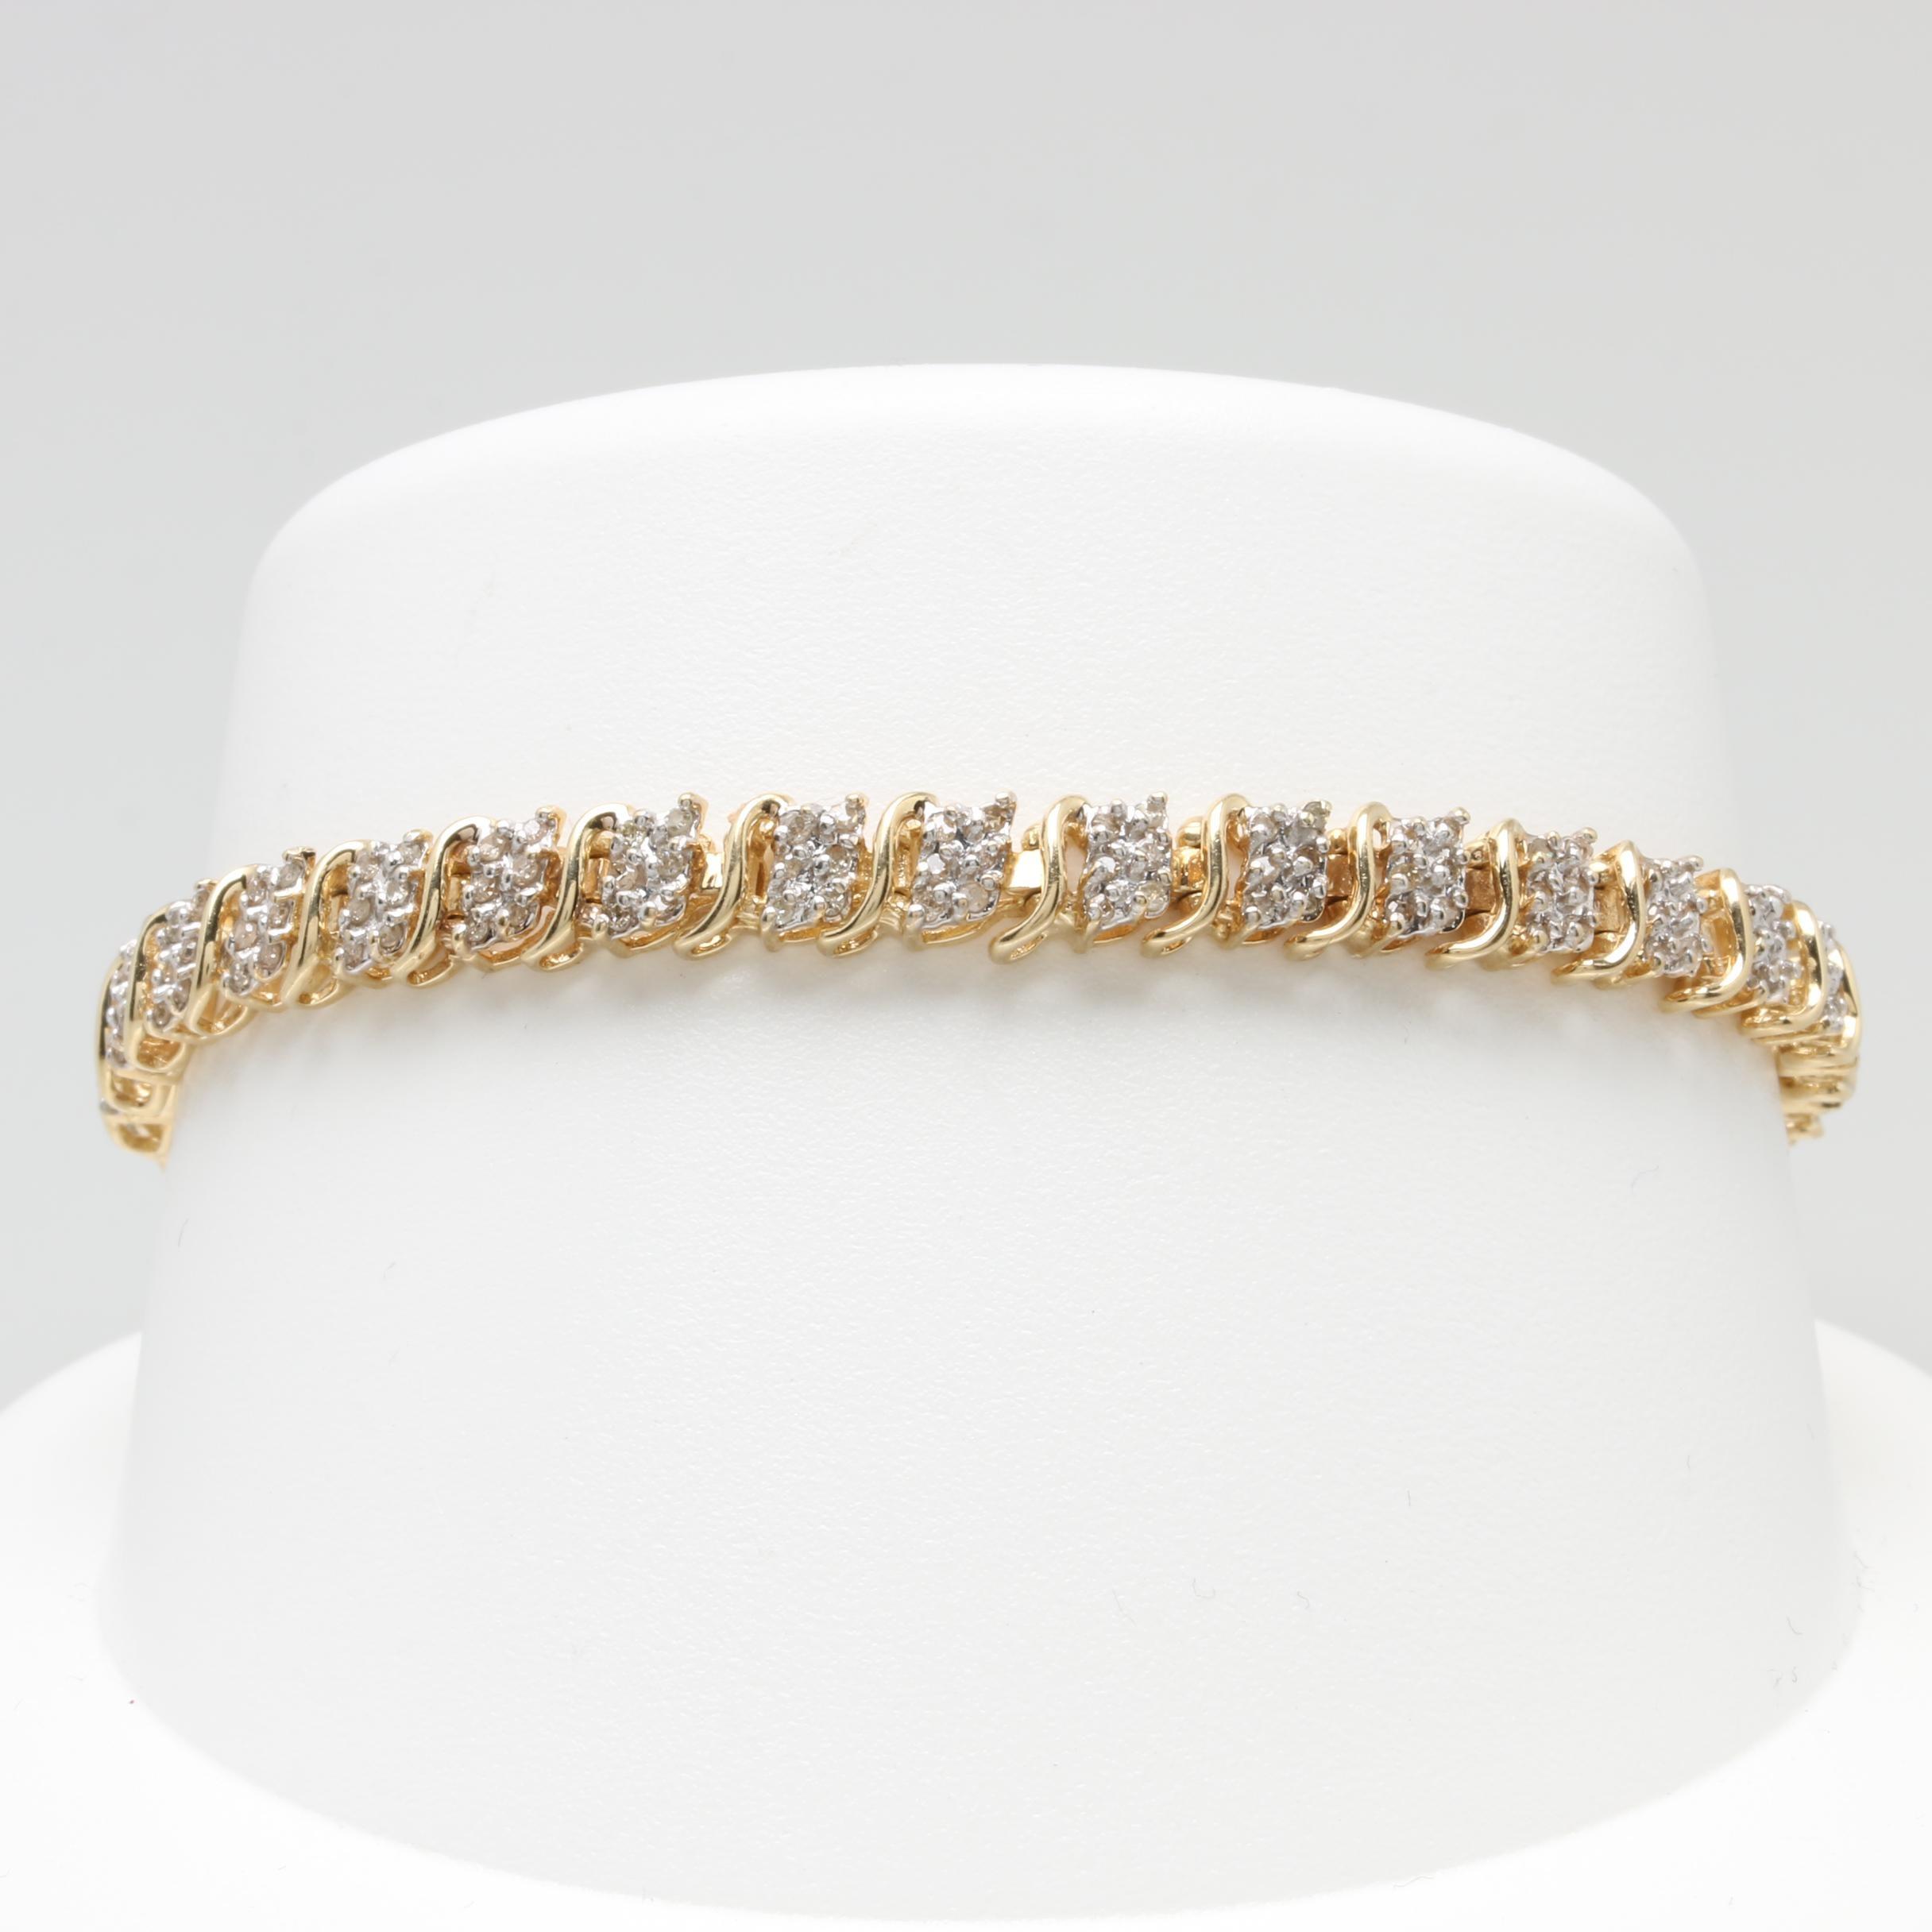 10K Yellow Gold 1.02 CTW Diamond Tennis Bracelet